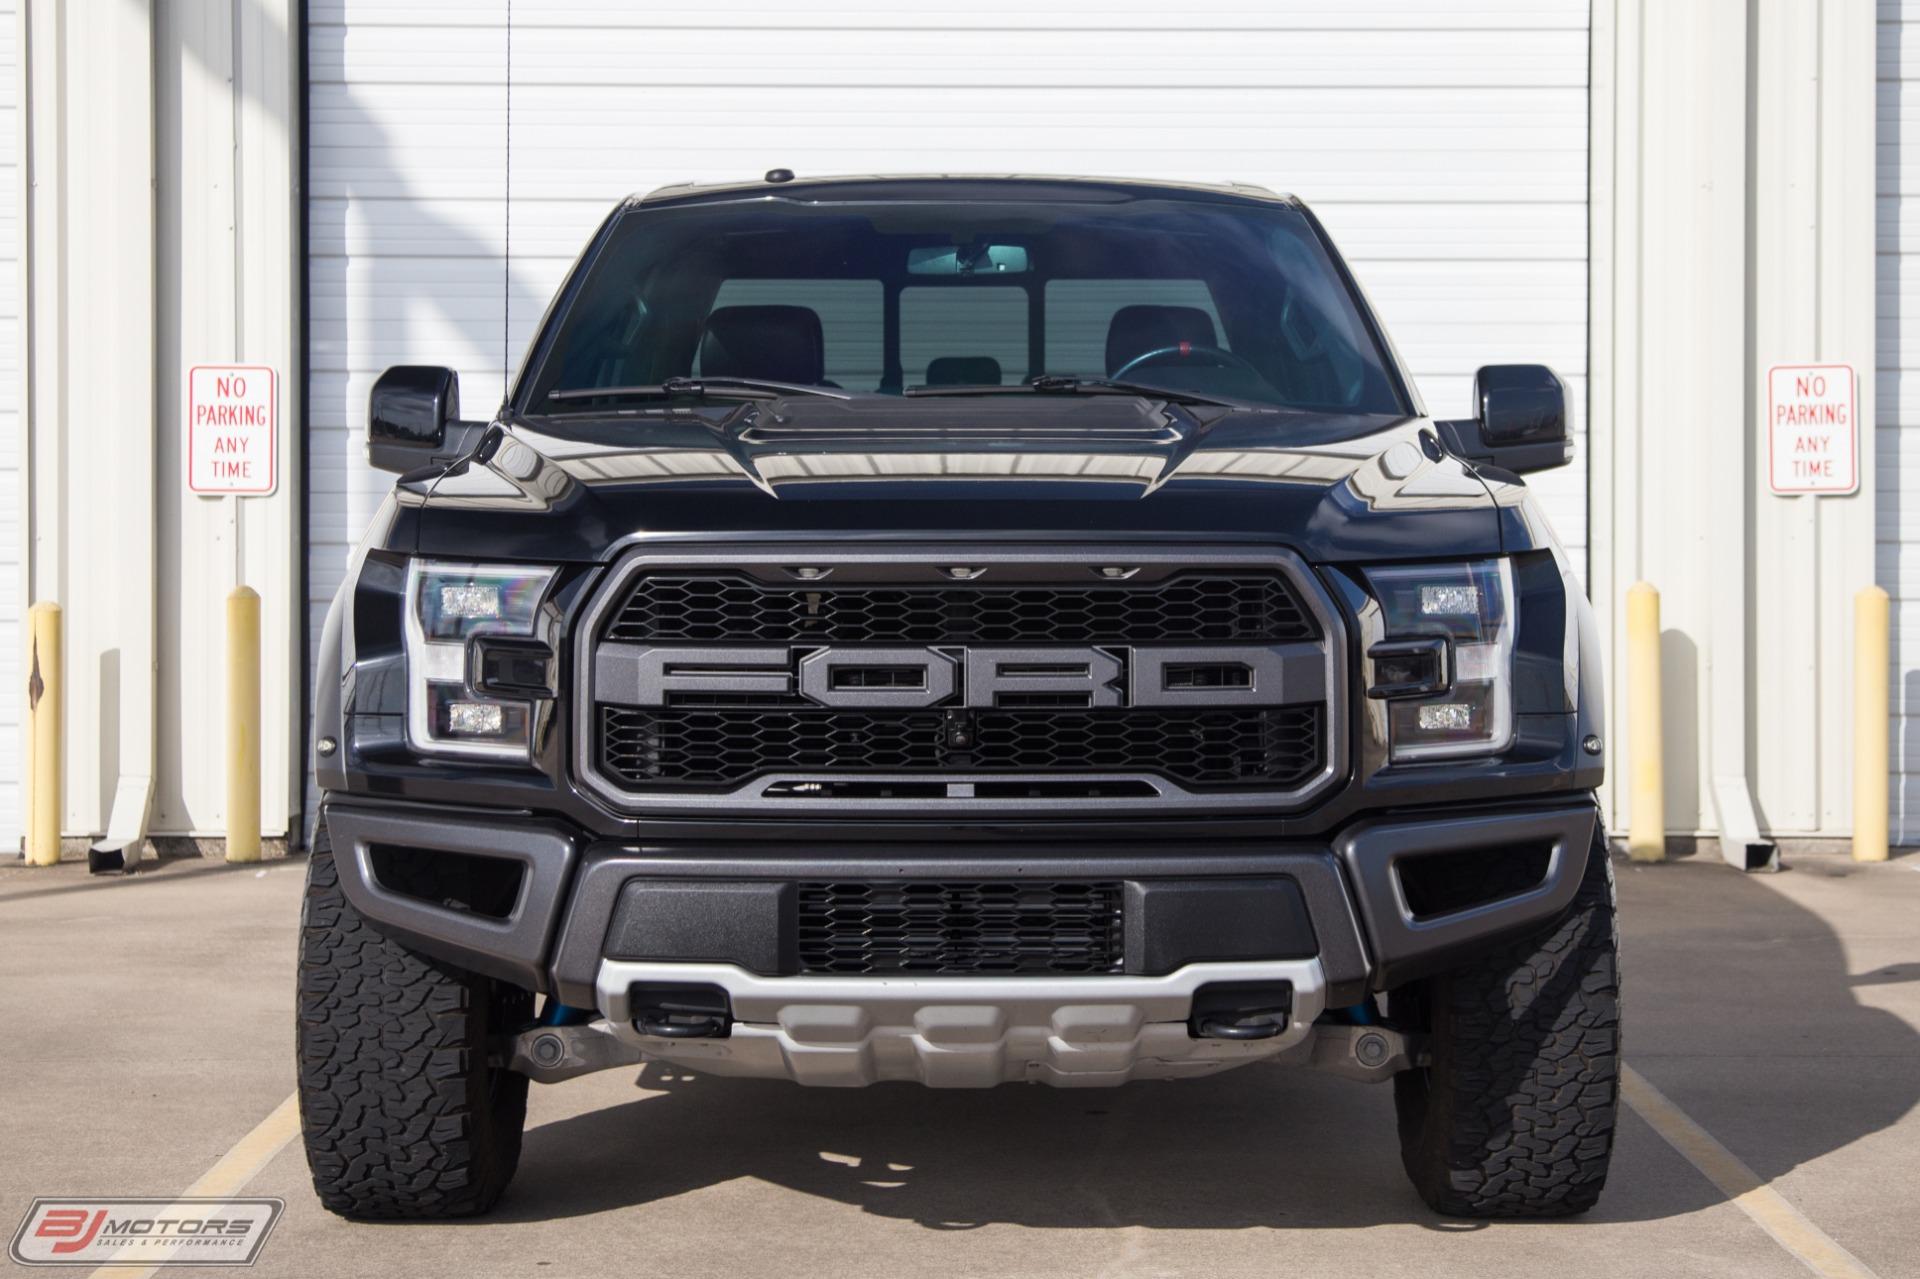 Used-2018-Ford-F-150-Raptor